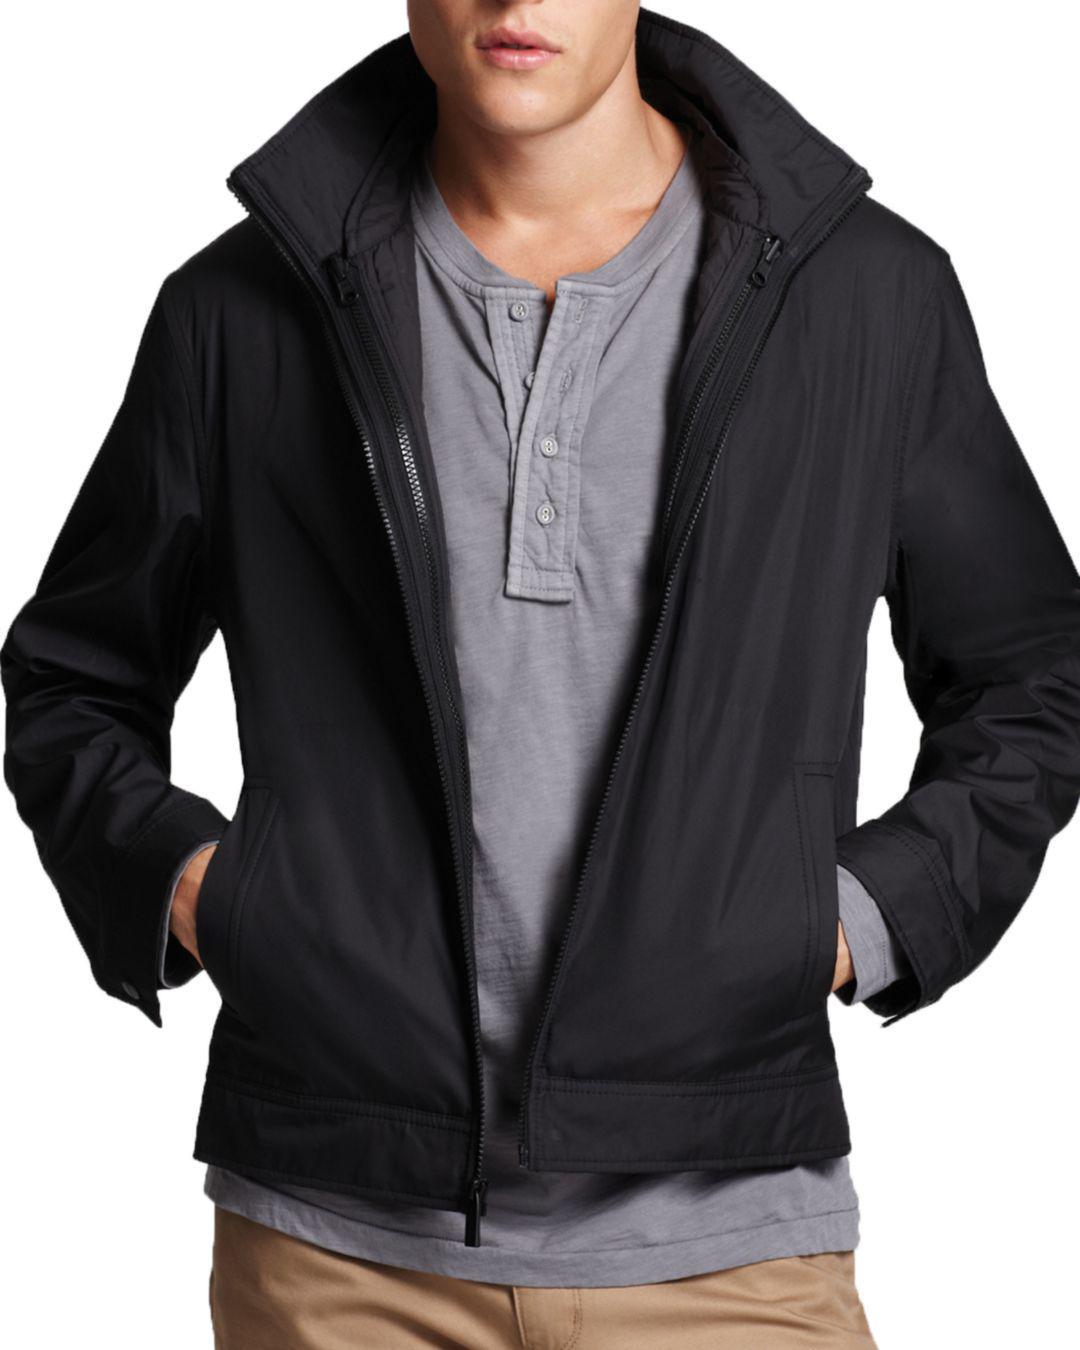 1cbb95bb4bc84 Lyst - Michael Kors 3-in-1 Track Jacket in Black for Men